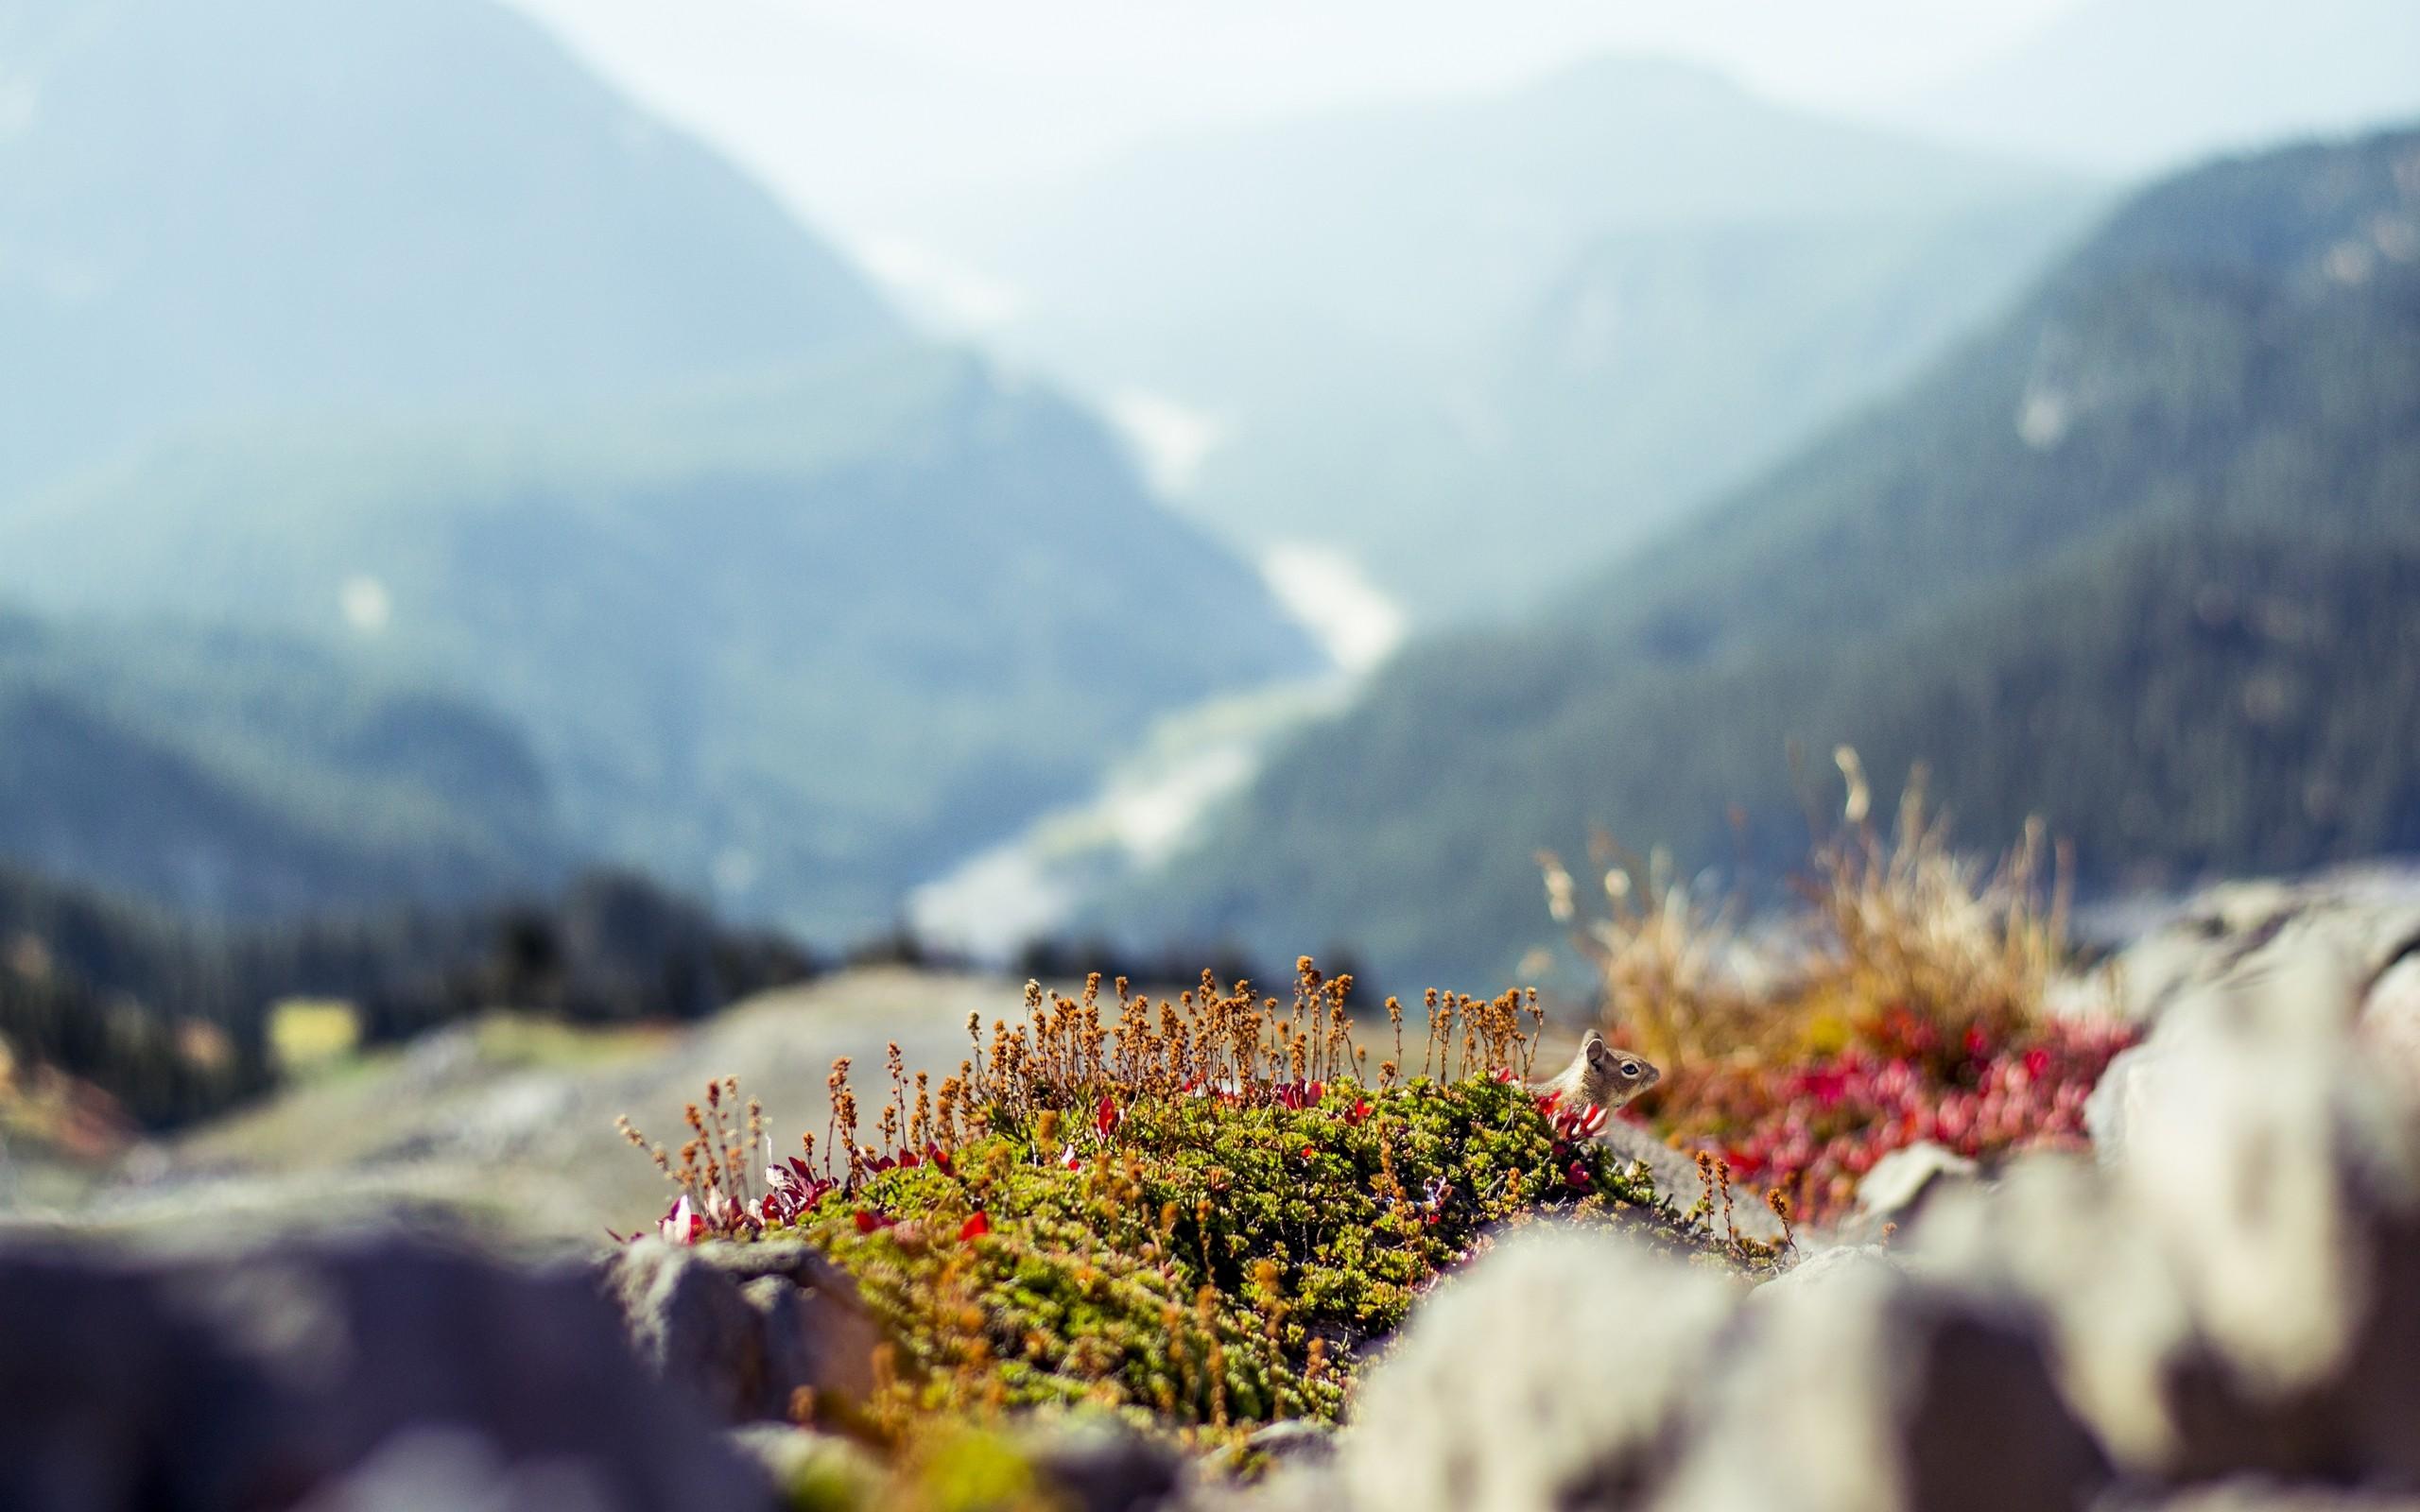 Chipmunk in mountains